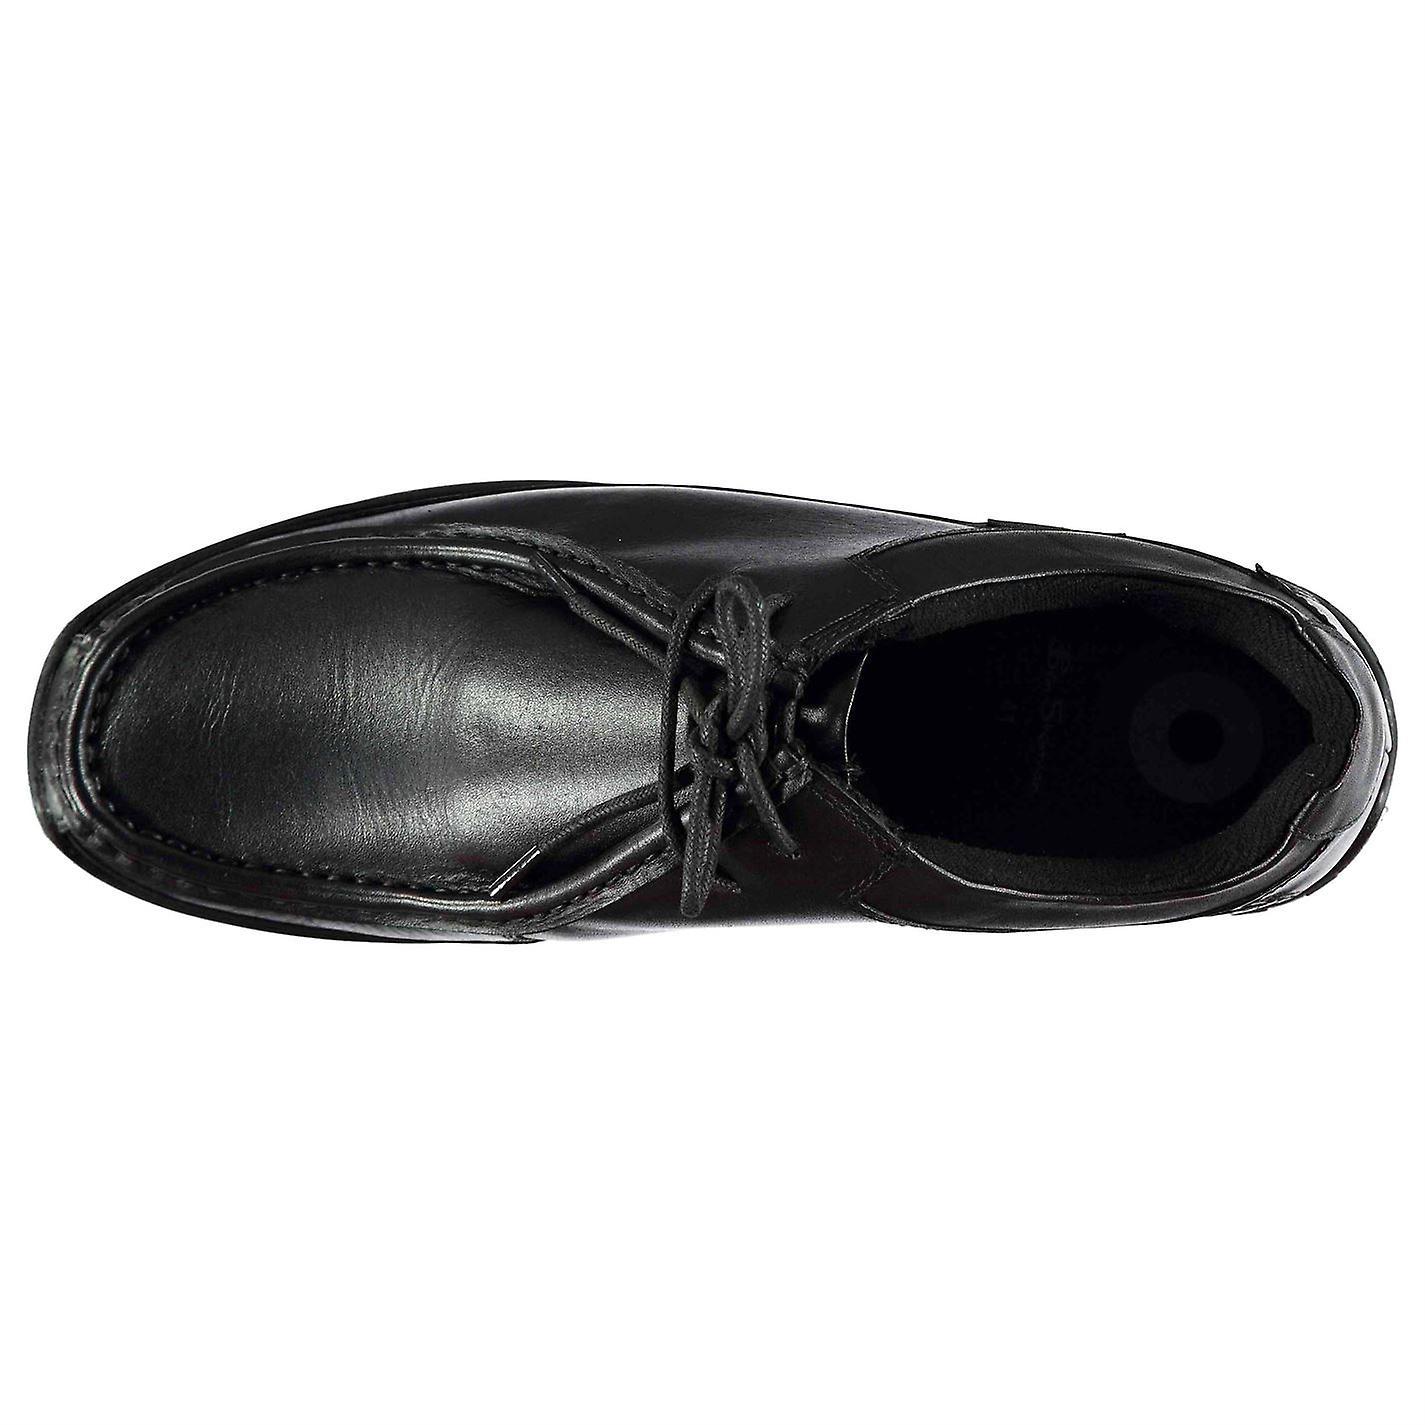 Ben Sherman Mens Ferdy Ferdy Ferdy scarpe Moc Toe Lace Up cuciture tonale   Di Alta Qualità Ed Economico    Uomini/Donne Scarpa  8648dd